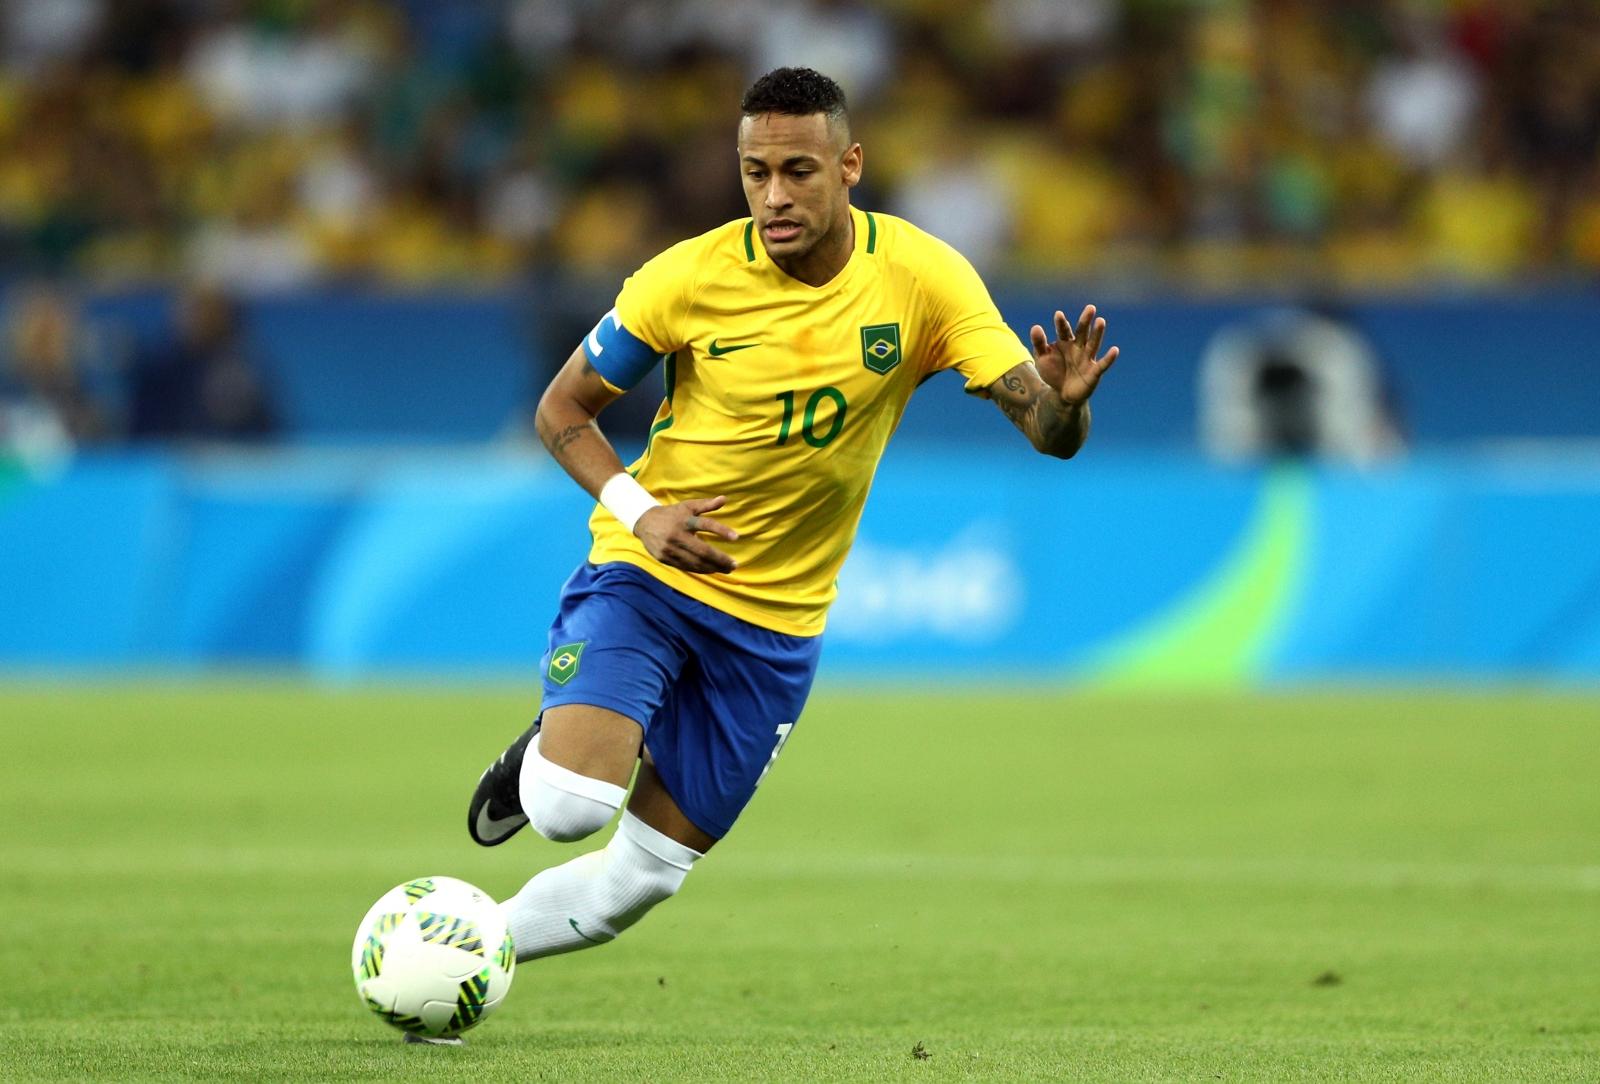 Neymar membuat debutnya bersama selecao pada 2010. Heading for the charts? Barcelona's Neymar launches music ...